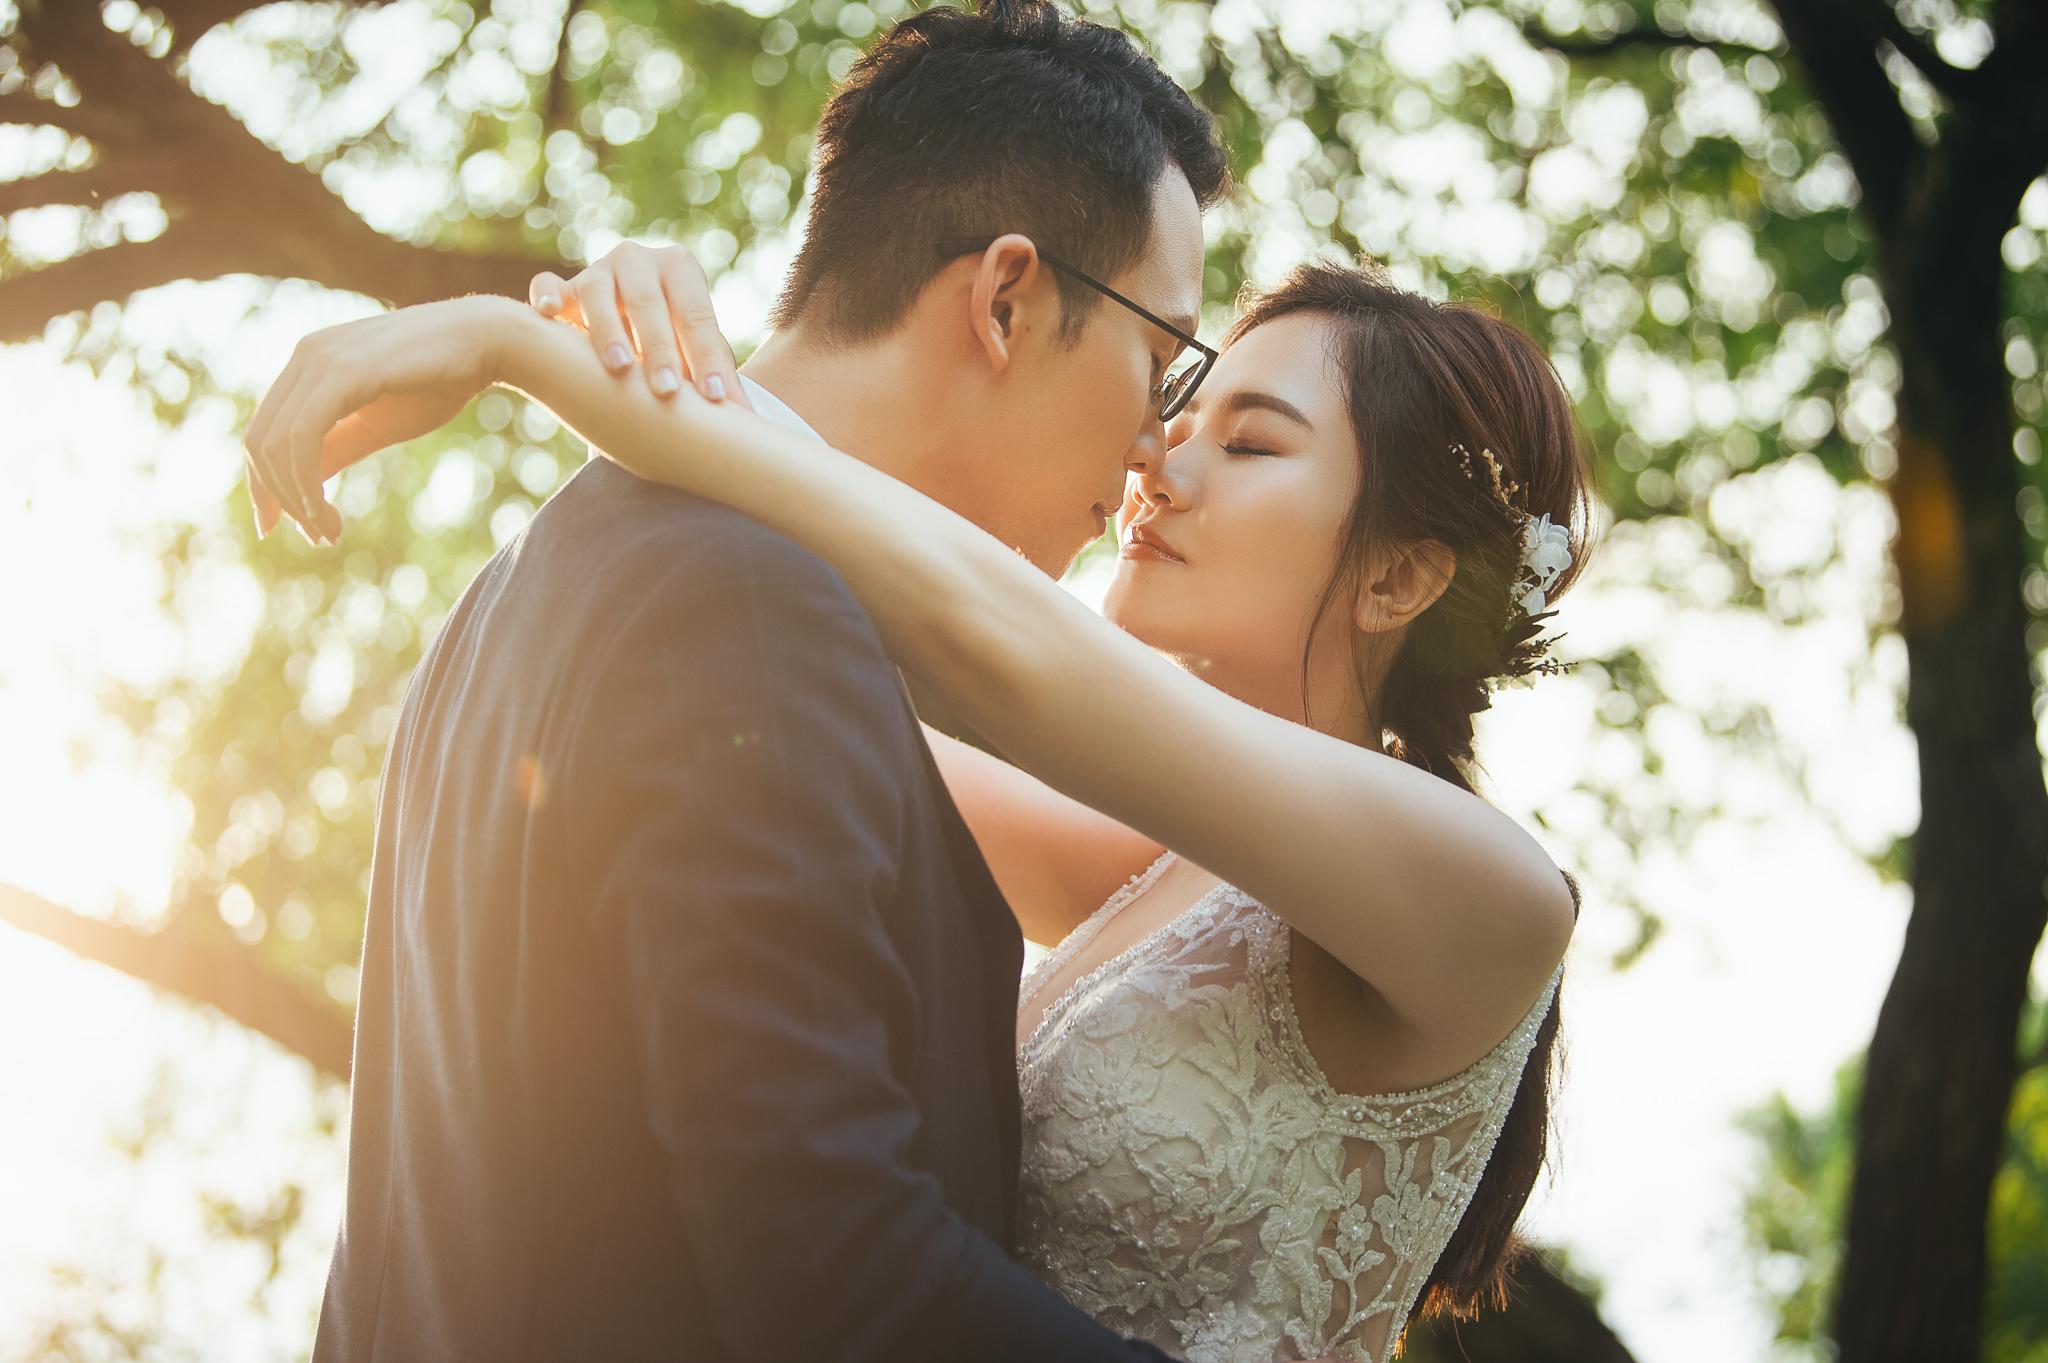 婚紗攝影 自助婚紗 婚紗包套 EASTERNWEDDING LIANG Photography 婚攝小亮